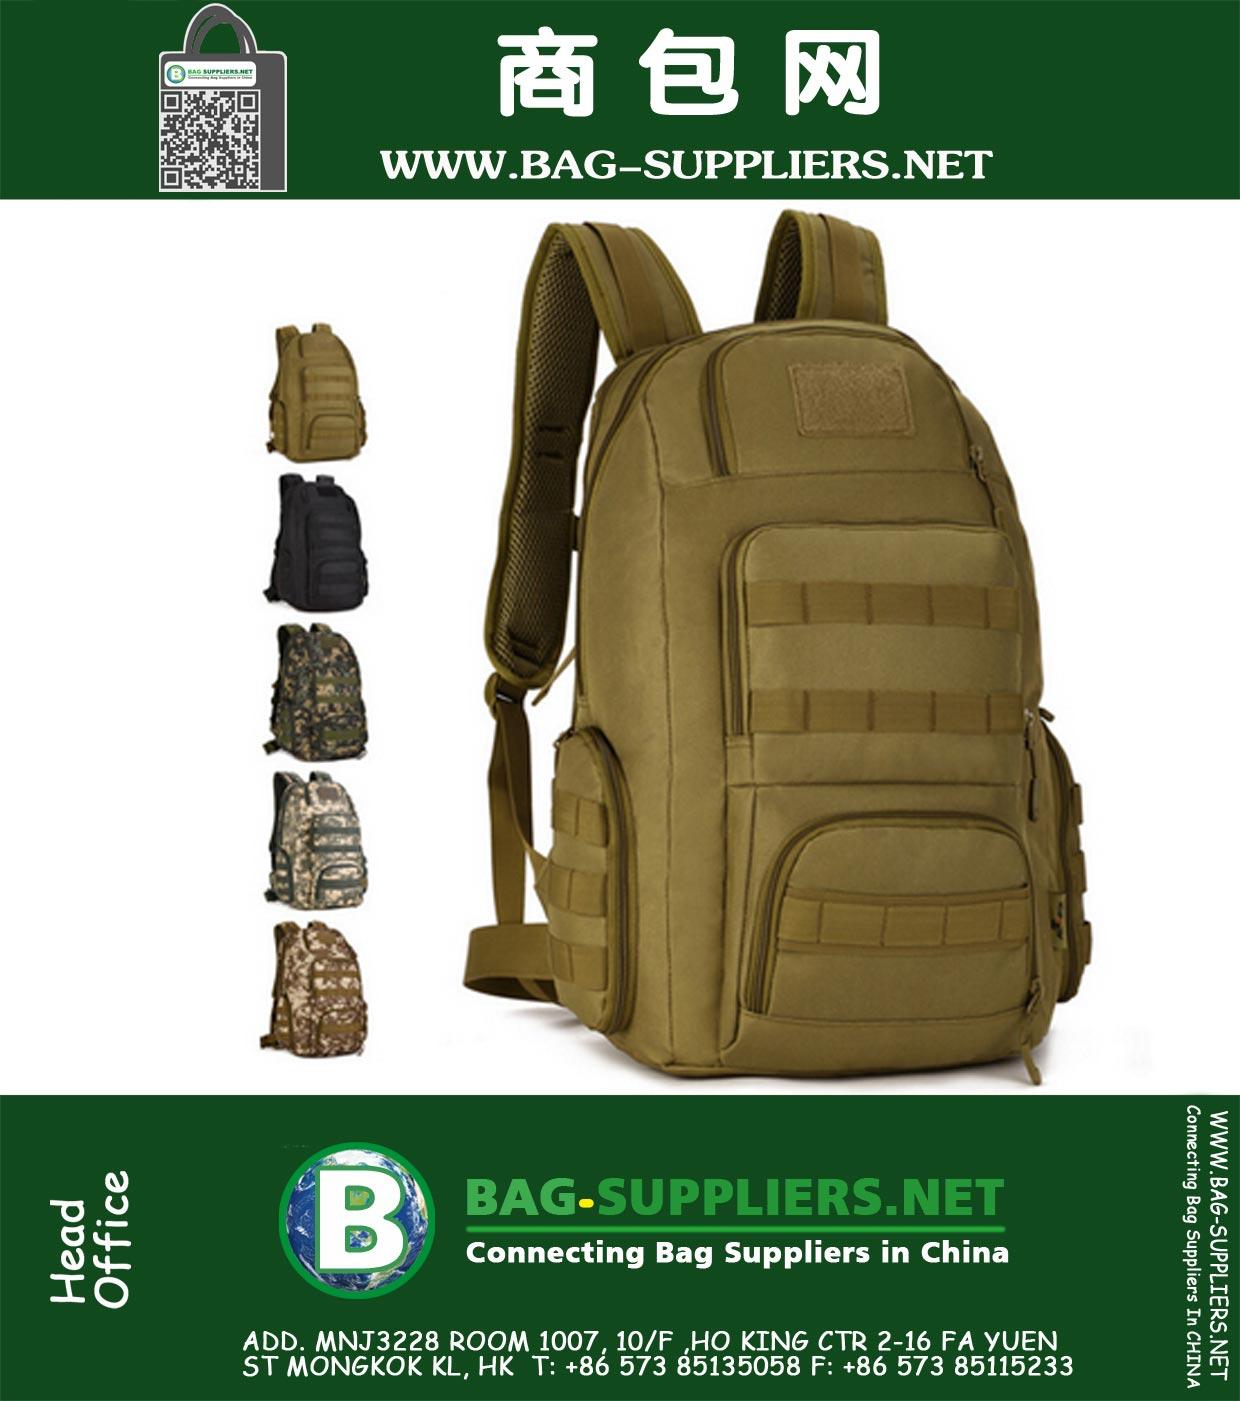 b9218c299 Molle Tactical Mochila Hombres Deportes al aire libre Bolsa de camuflaje  militar Caza Trekking Senderismo Mochilas escolares Bolsas para portátiles  40L